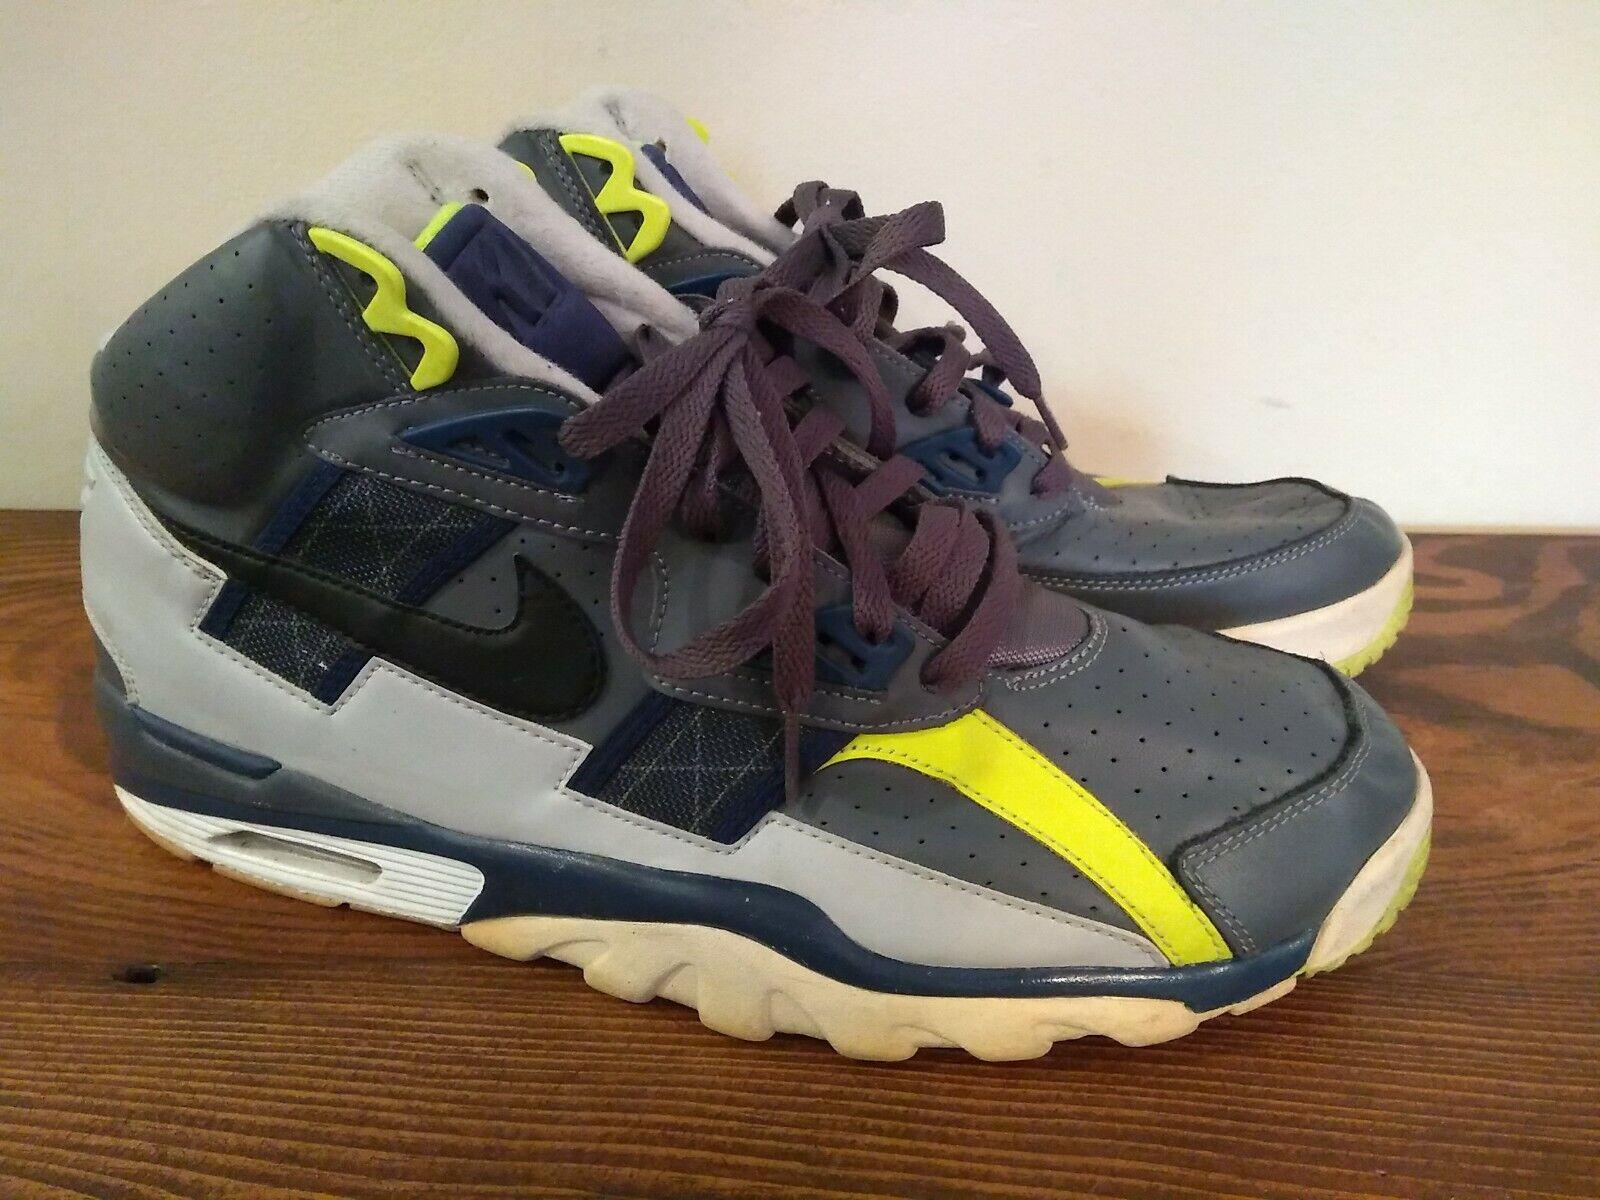 bo jackson gym shoes